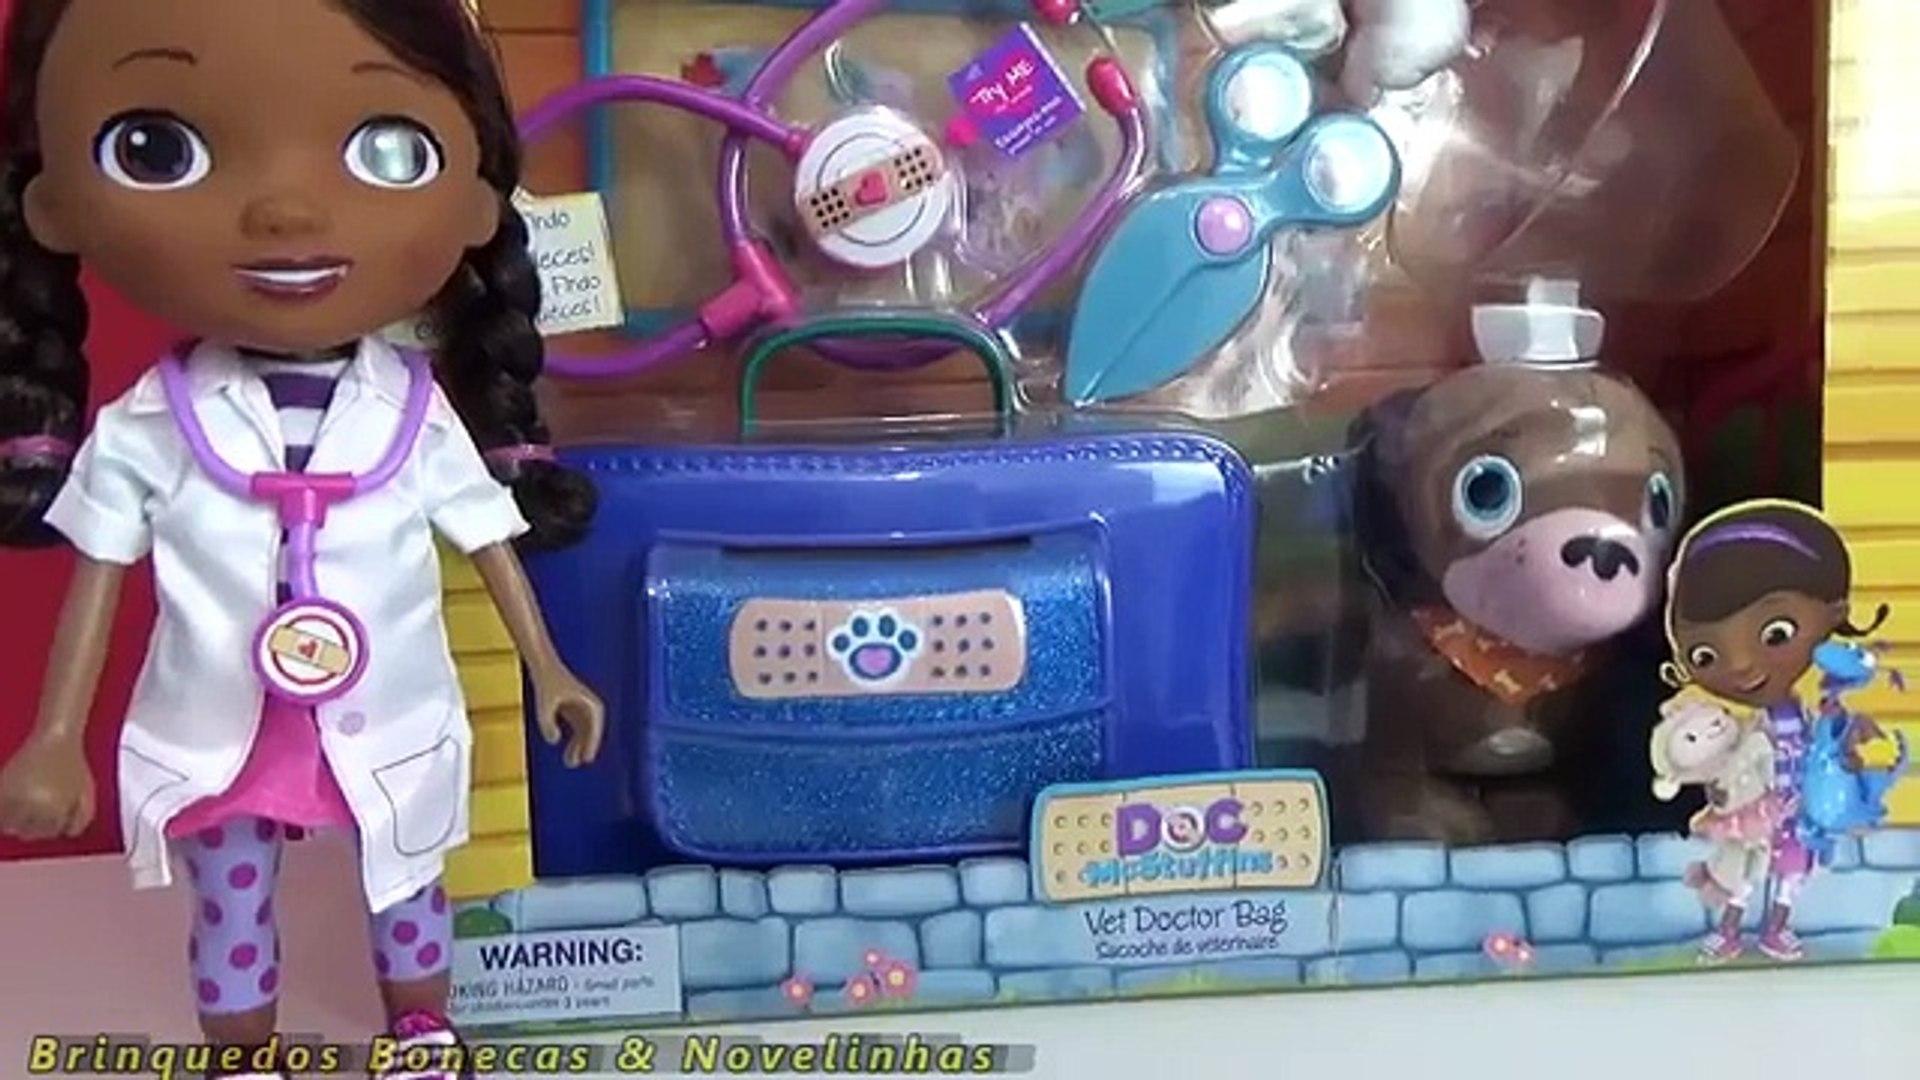 Doutora Brinquedos Kit Veterinario Brinquedo New Doc Mcstuffins